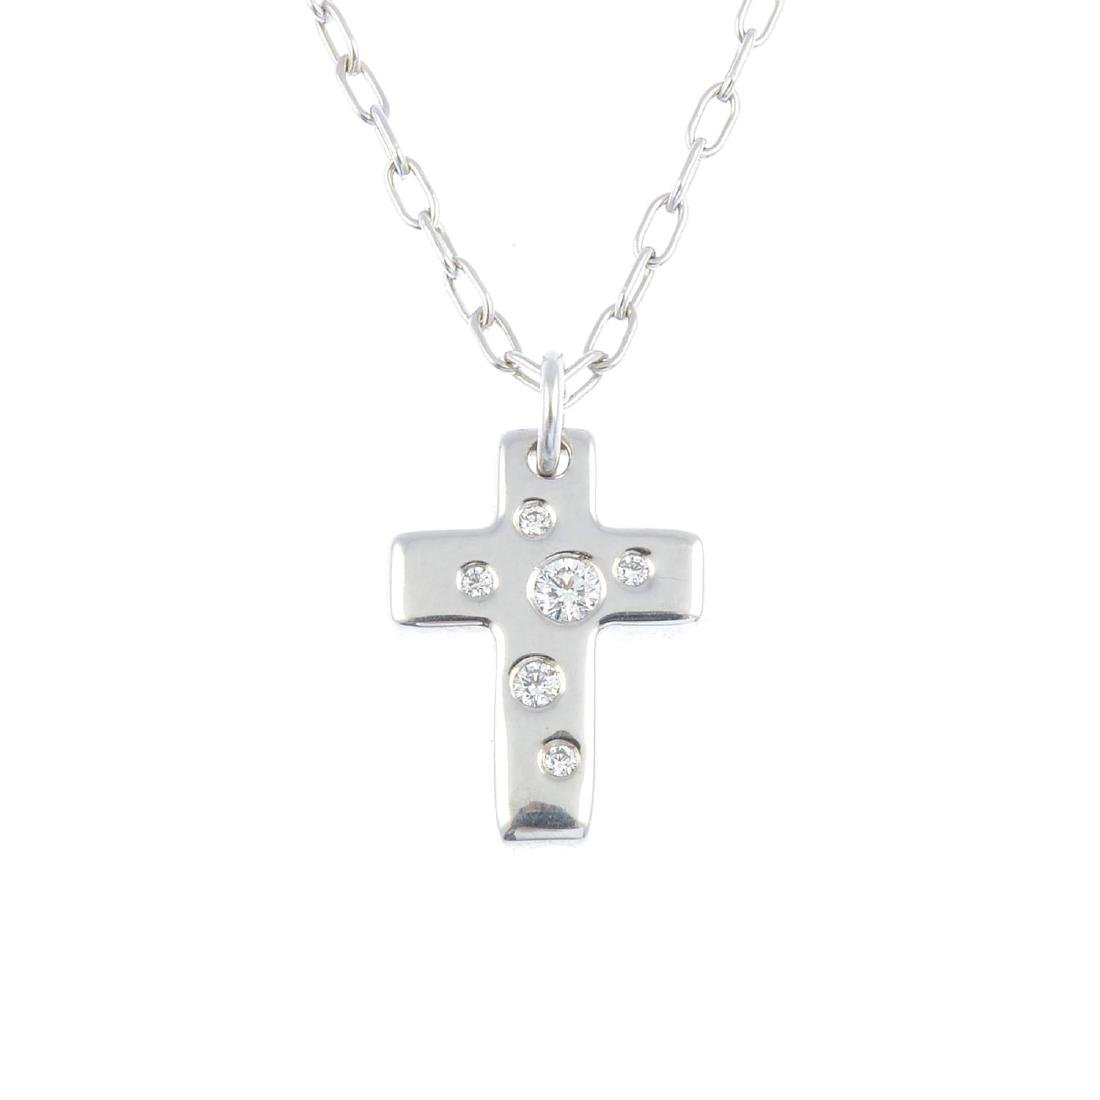 TIFFANY & CO. - a diamond 'Etoile' pendant. Designed as